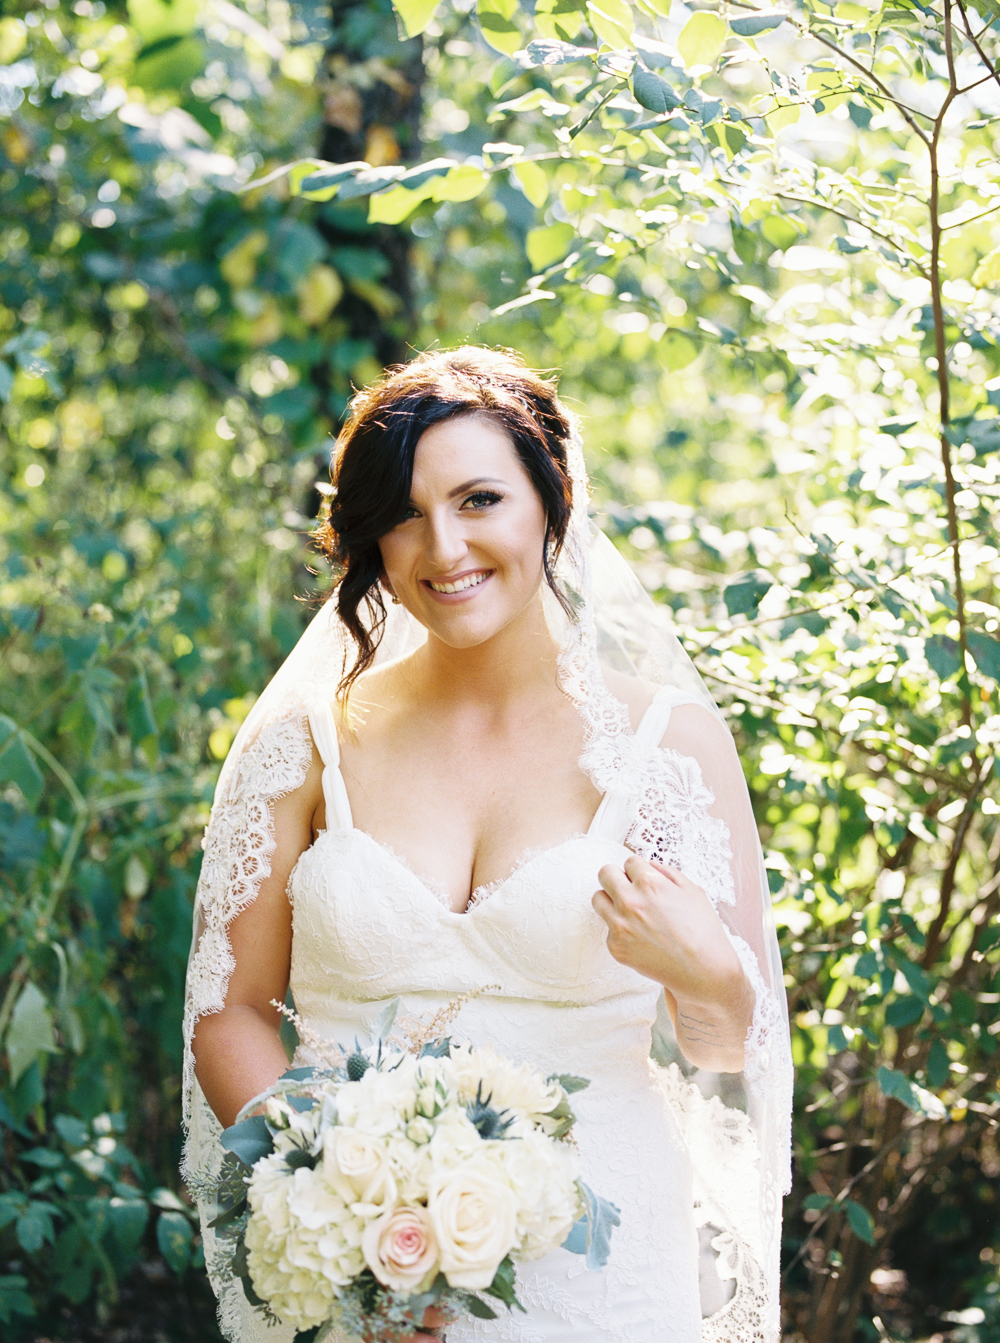 jamie+trey_wrens nest film wedding photographers natural light ©2016abigailbobophotography-14.jpg